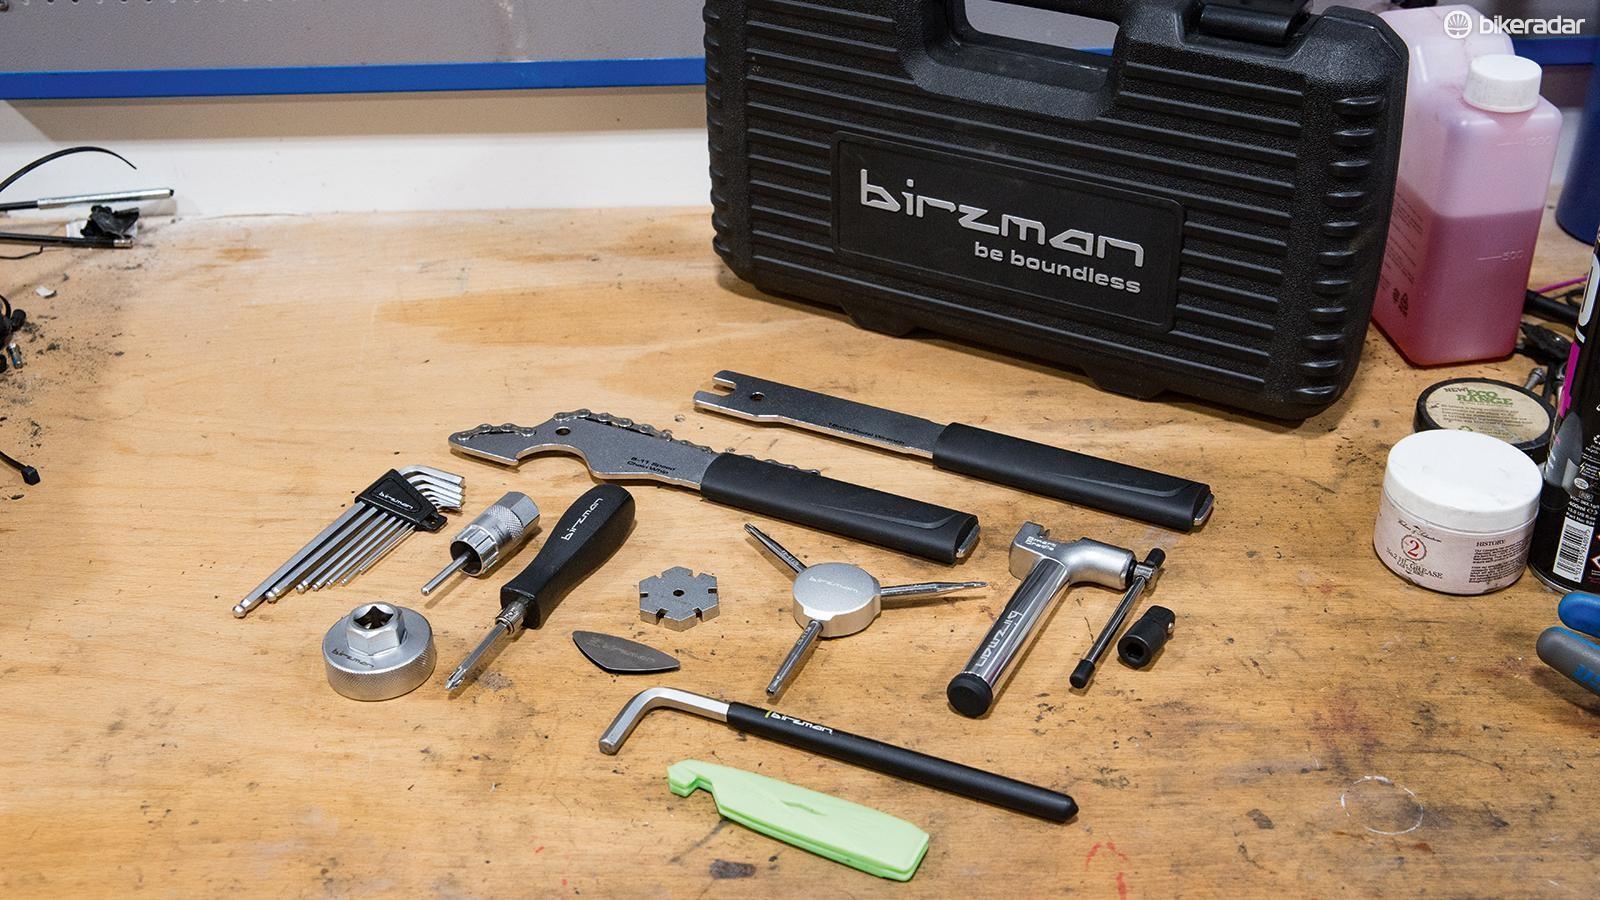 best-of-basic-tool-kit-01-1533031324862-1j4hly7475ze7-961a288